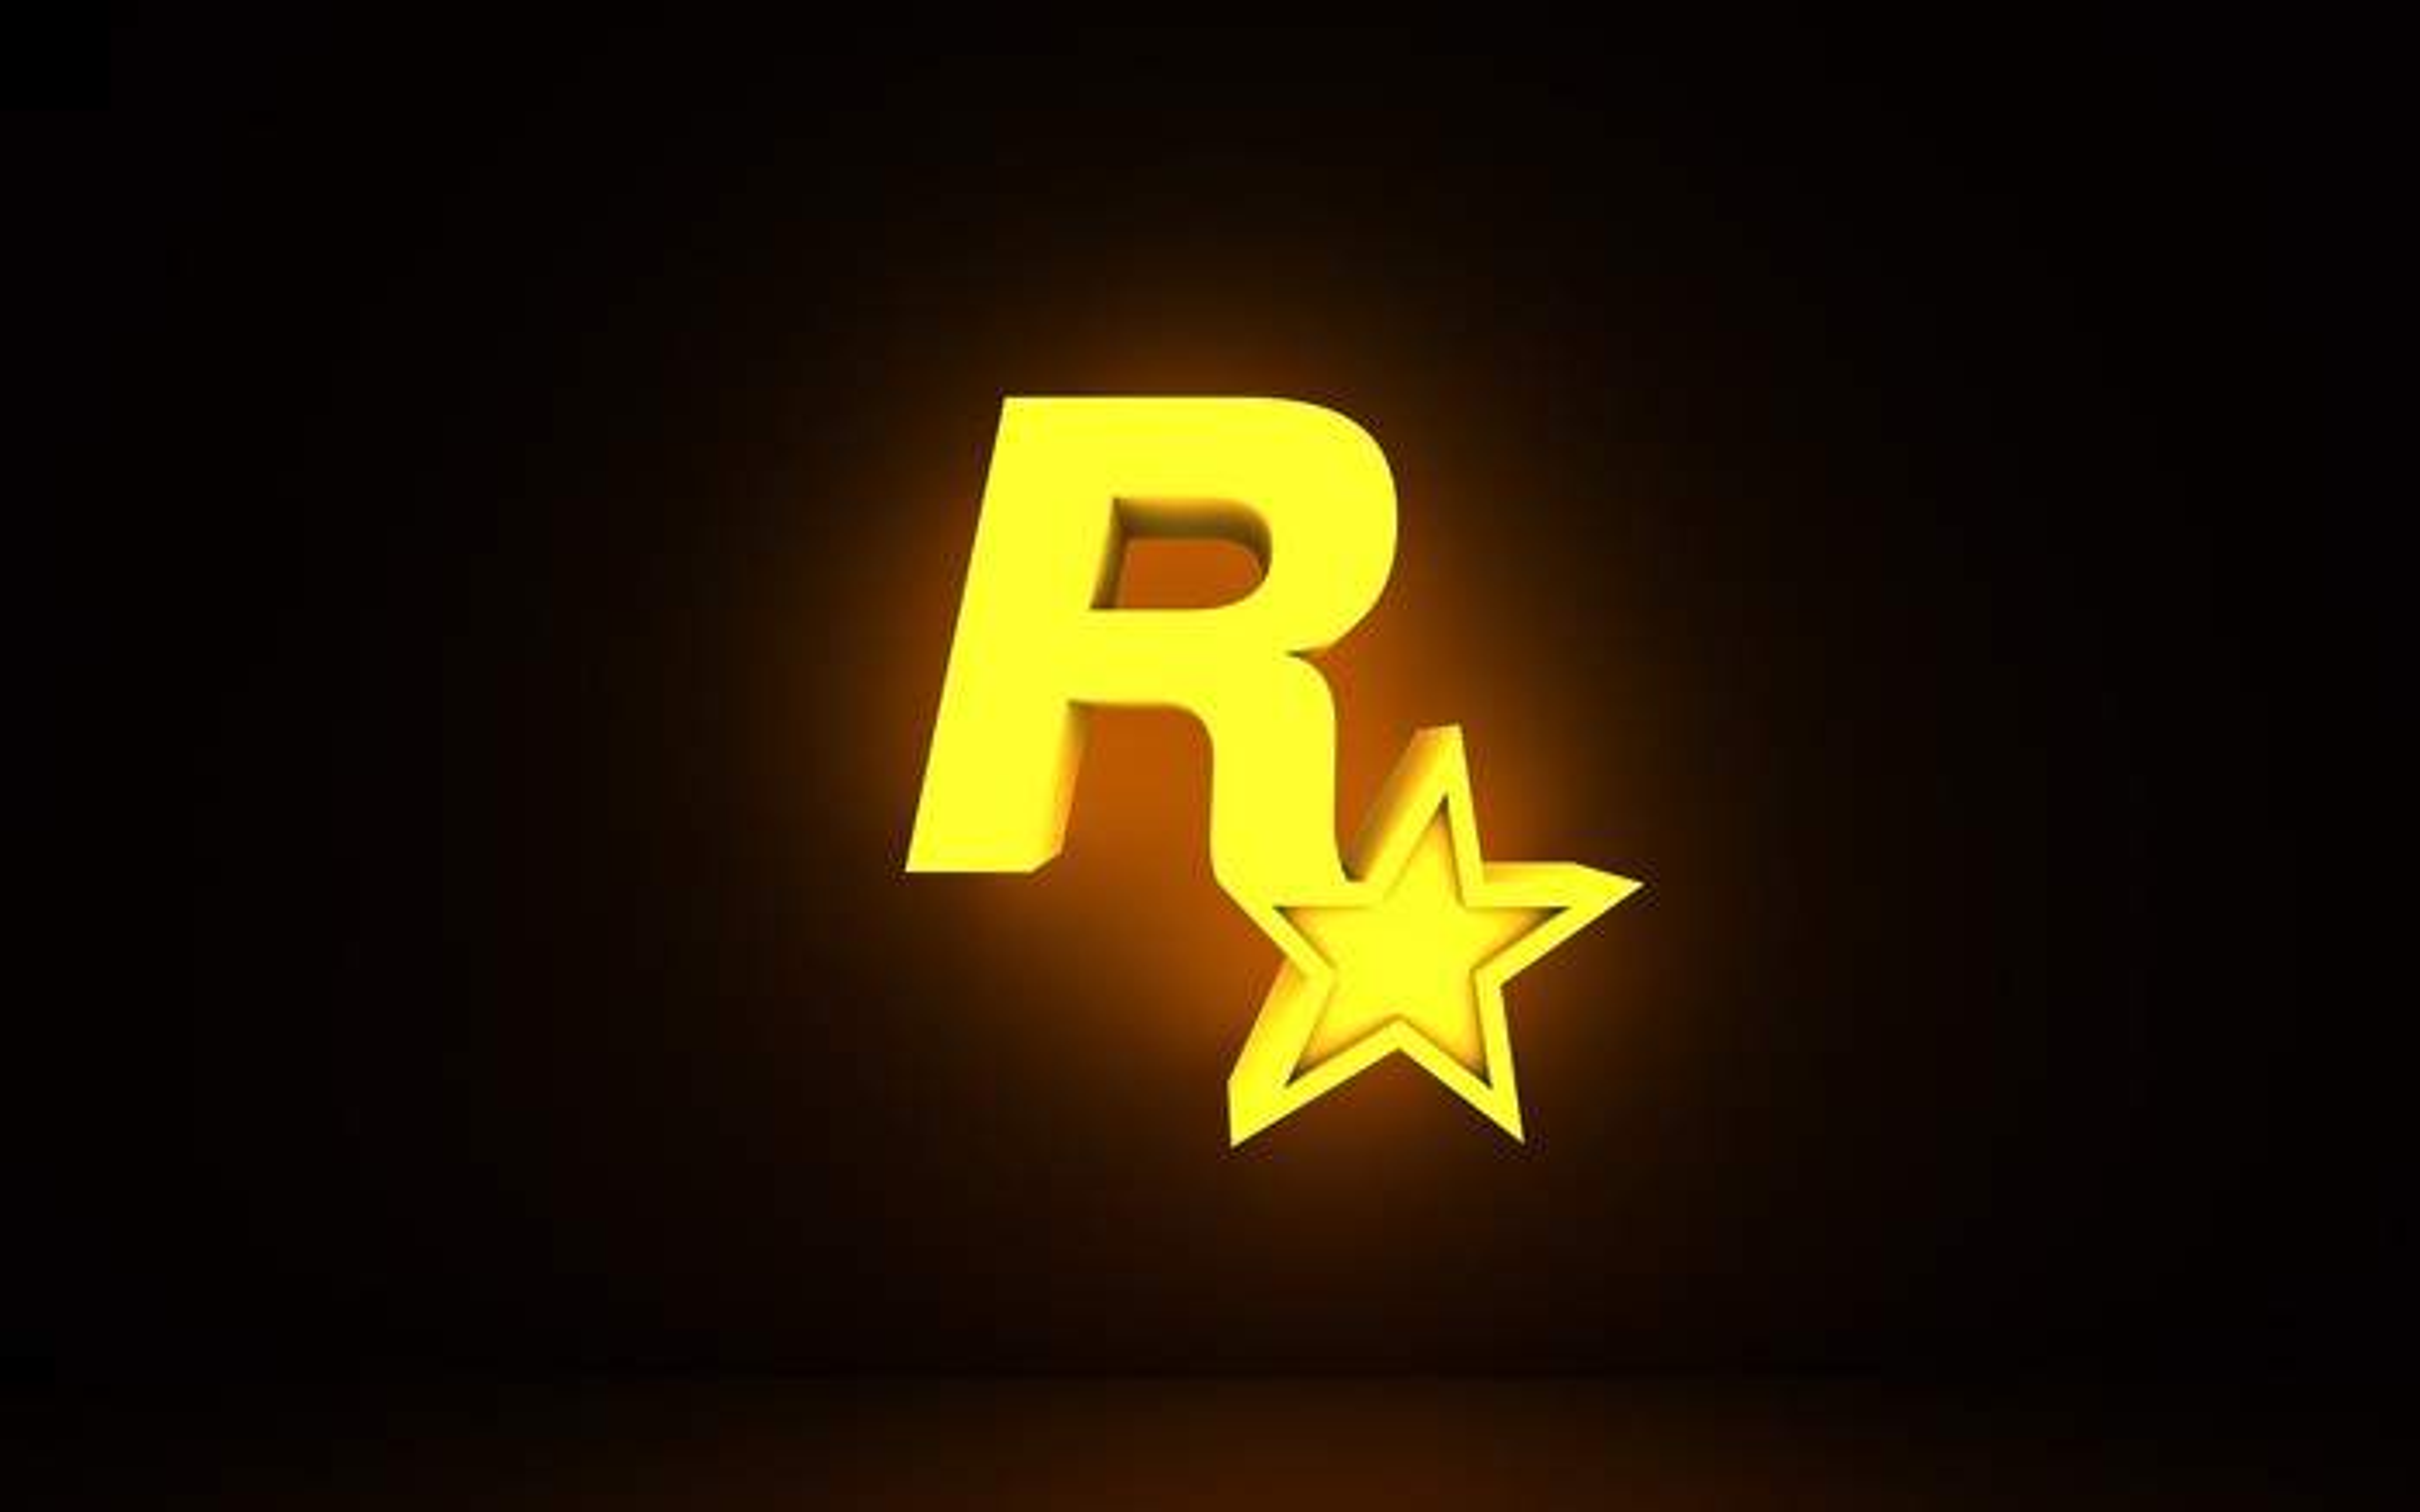 Take Two's Rockstar Games subsidiary logo